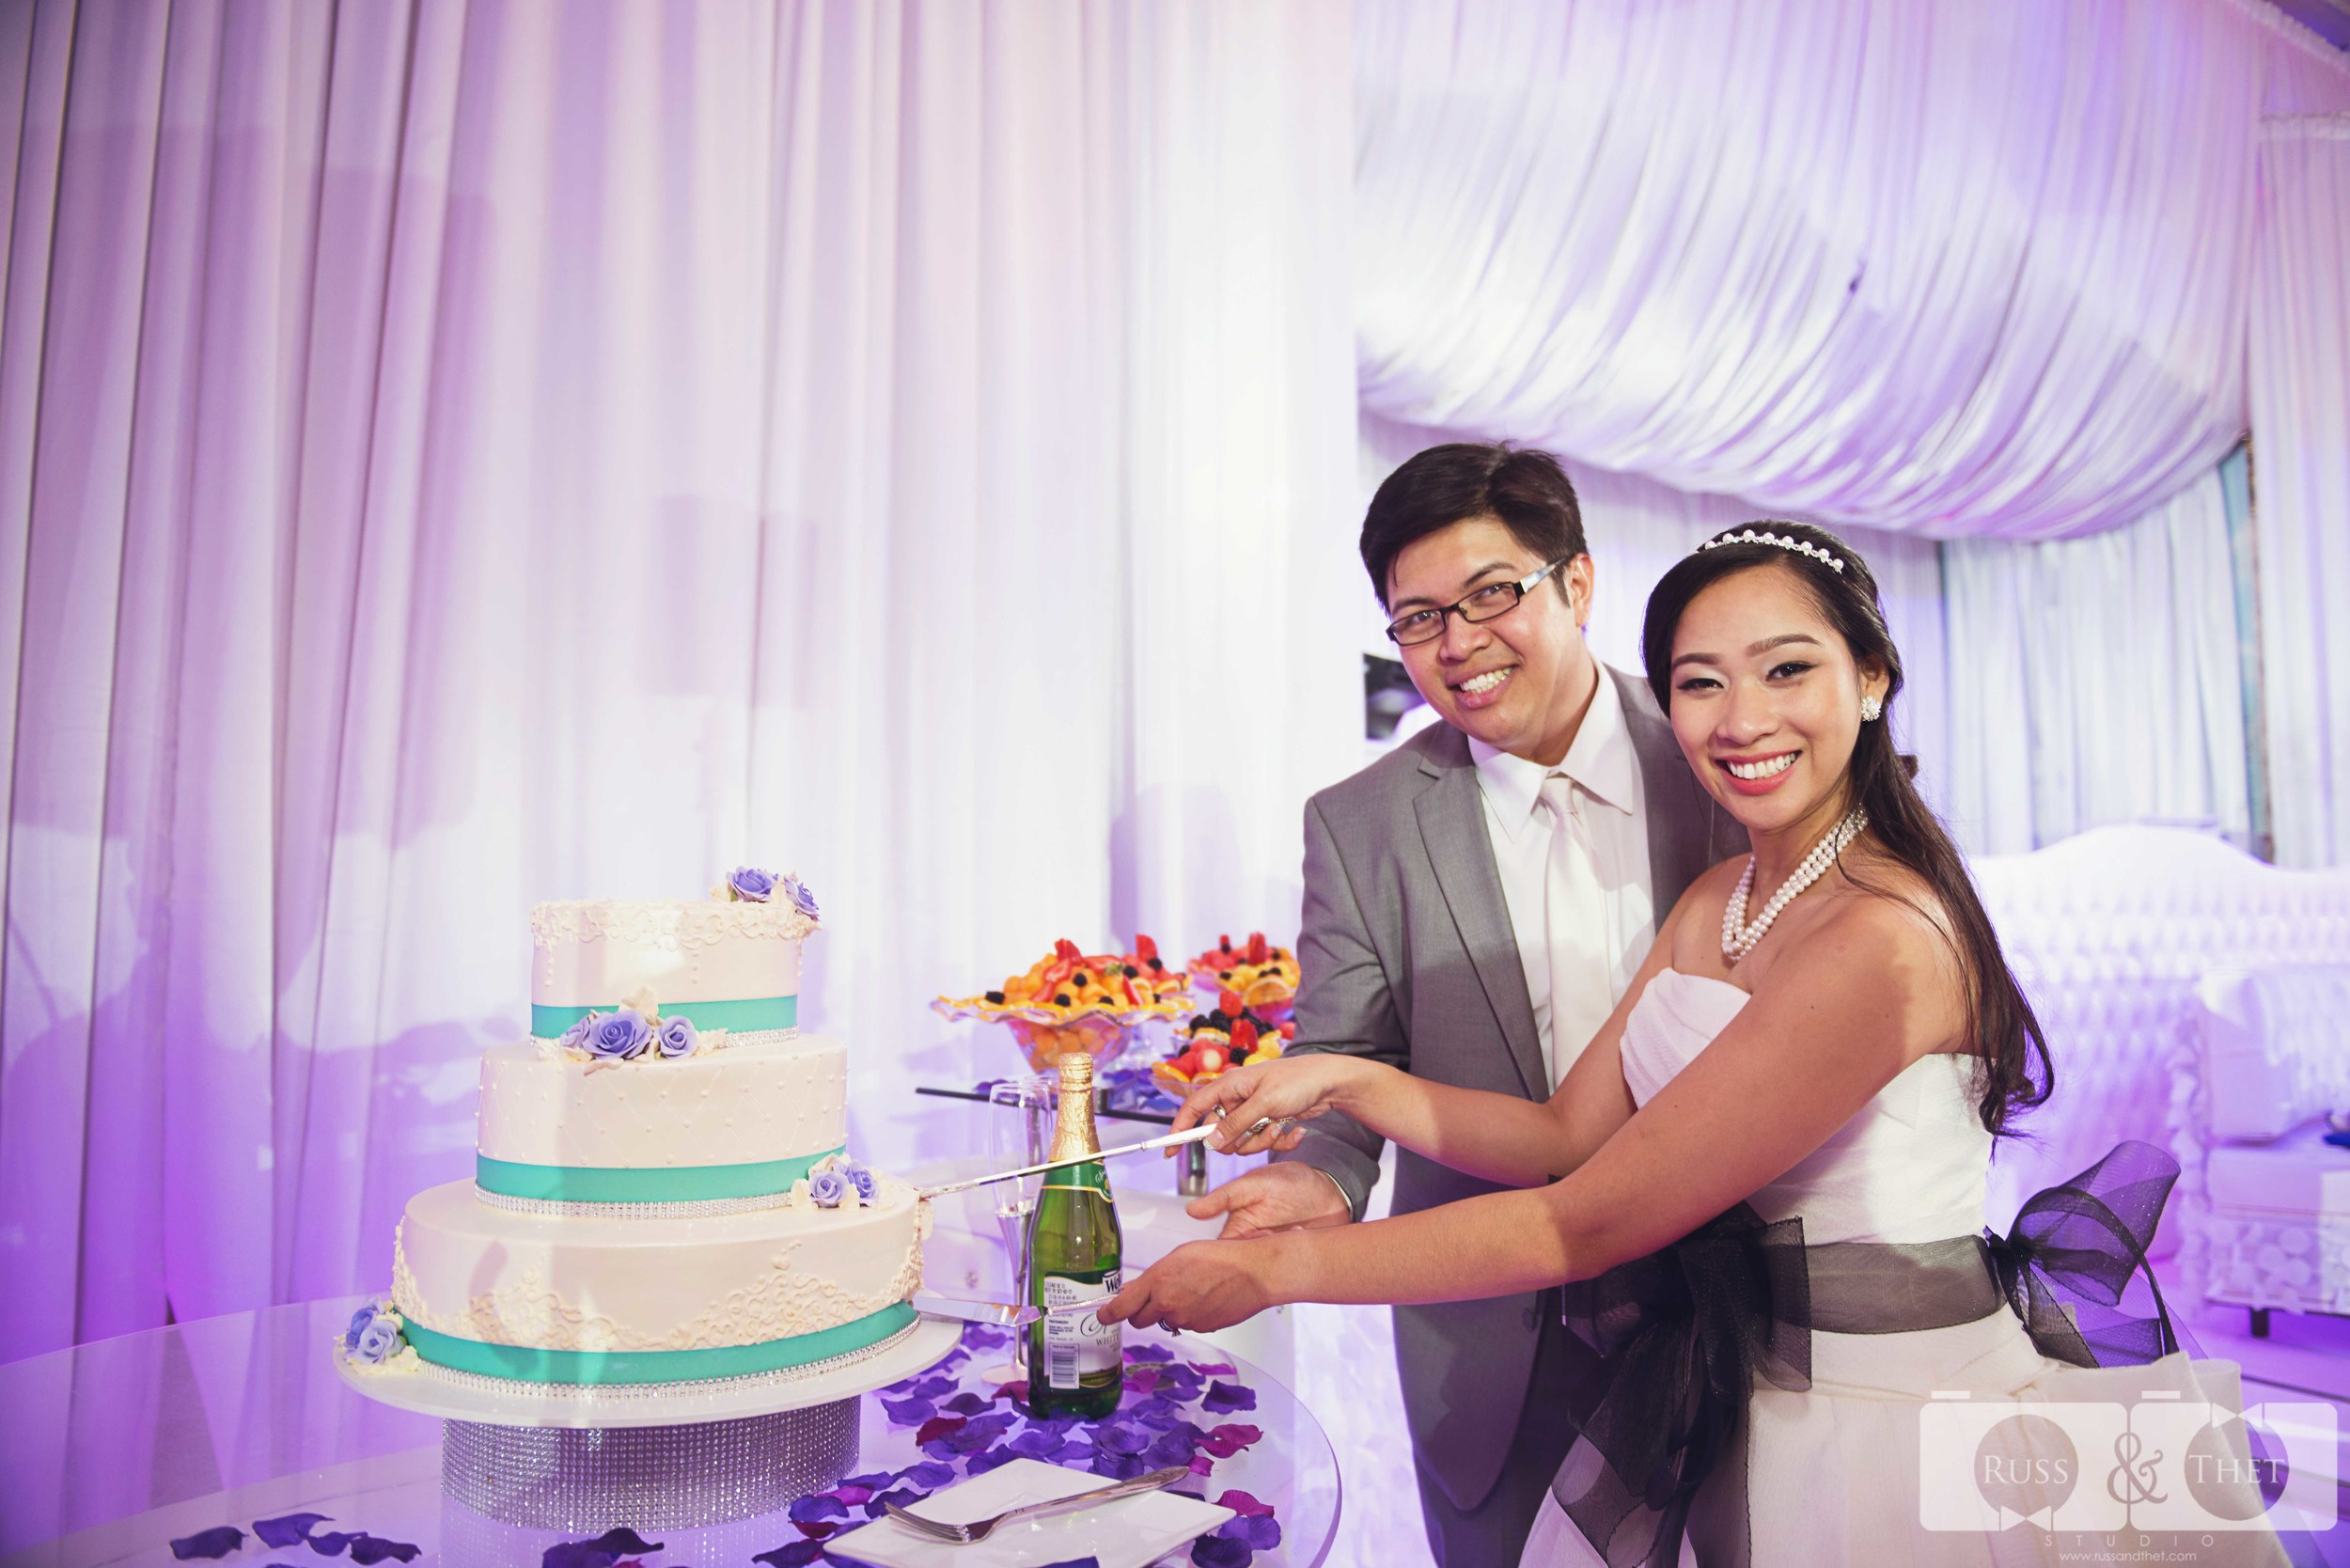 royal-palace-banquet-hall-glendale-wedding-62.JPG